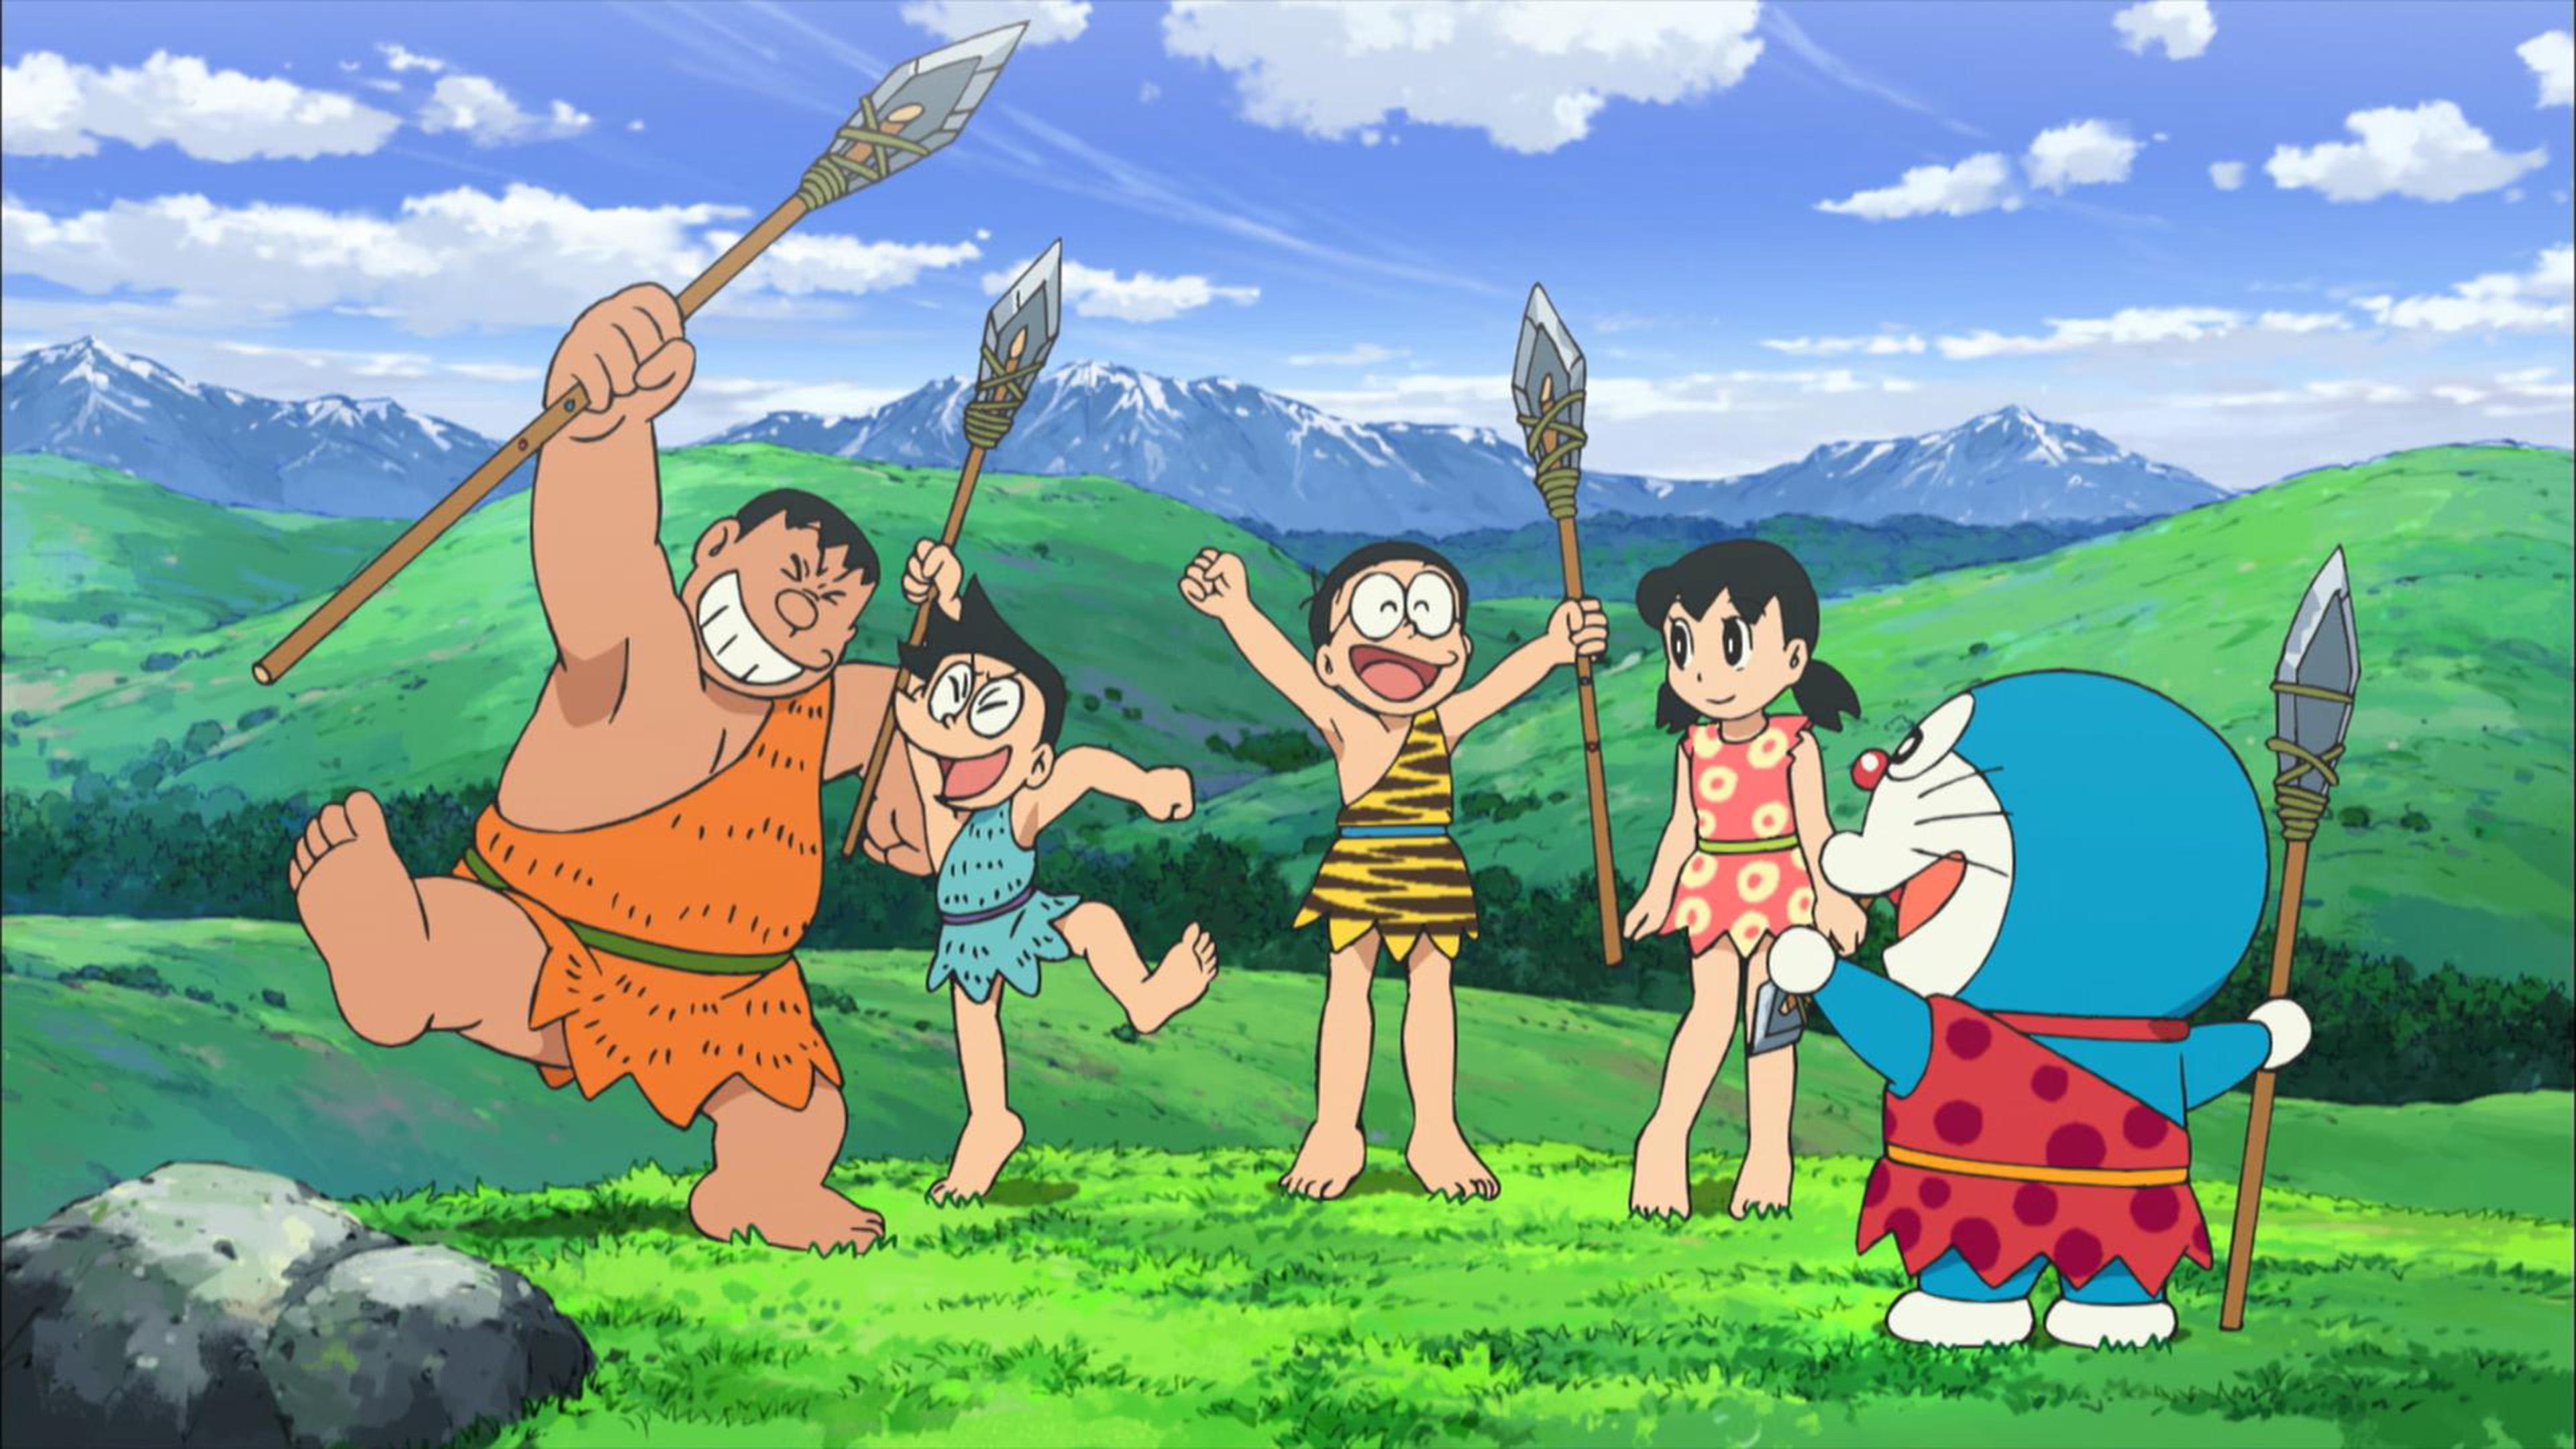 Wallpaper Doraemon Movie - Bakaninime